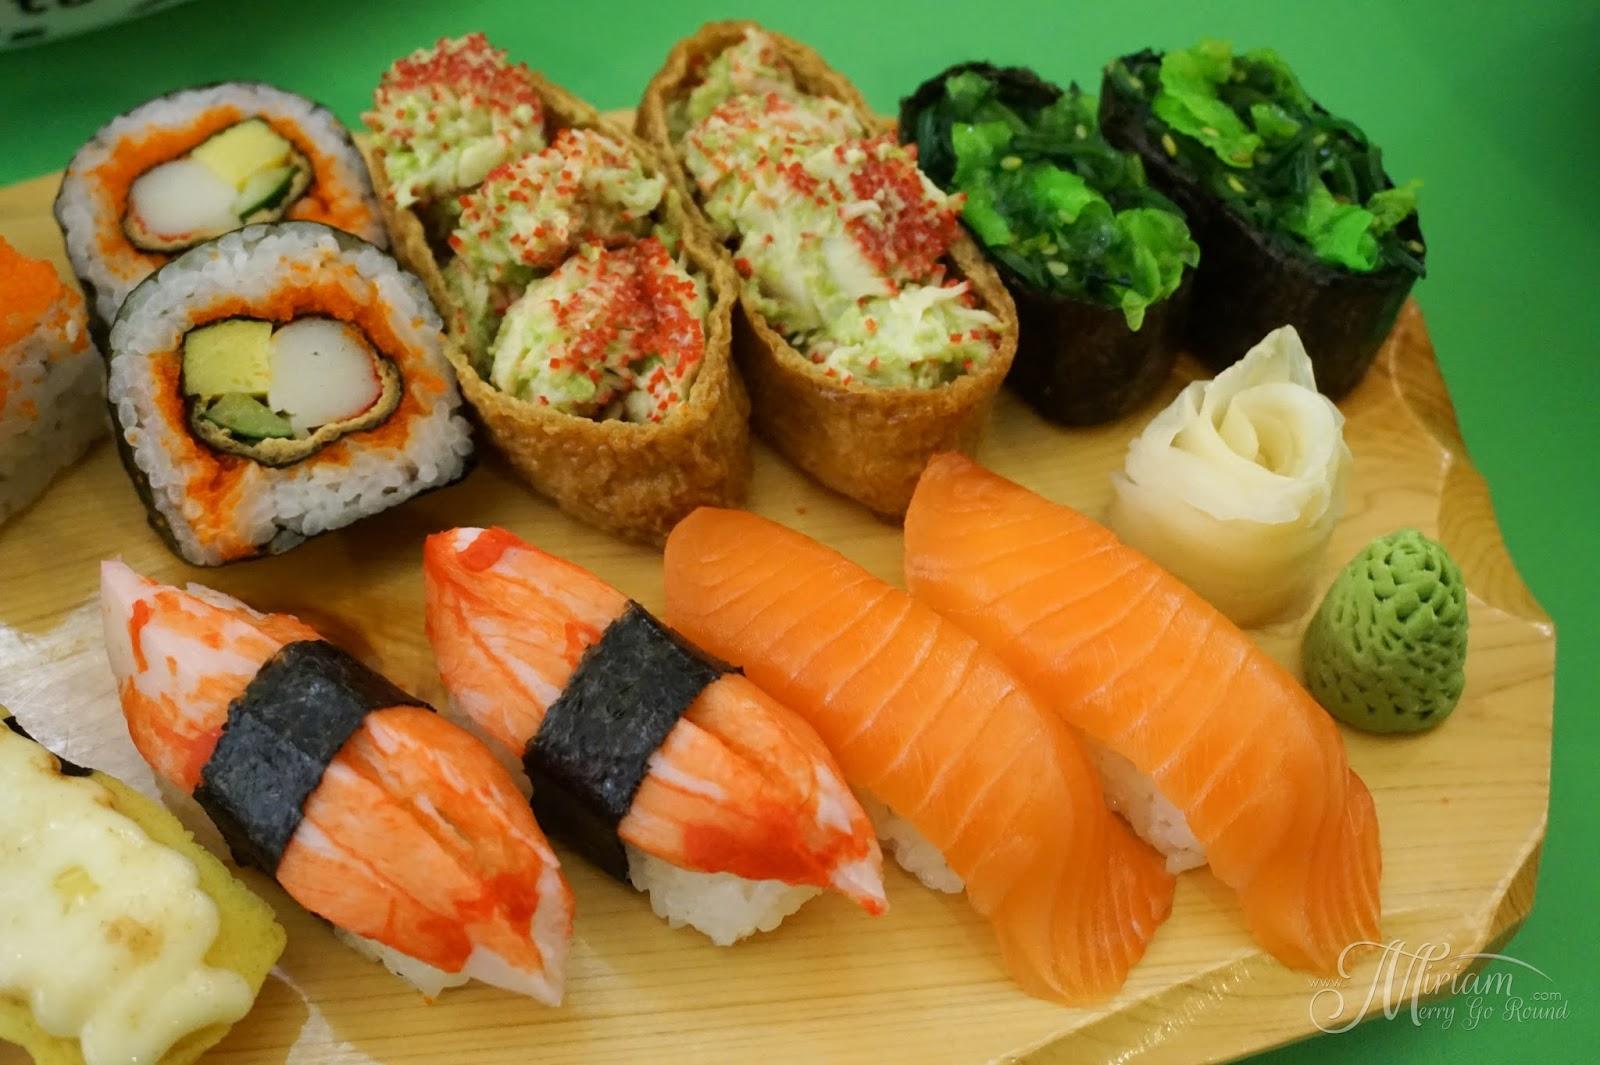 sakae sushi 19th anniversary dine match redeem. Black Bedroom Furniture Sets. Home Design Ideas